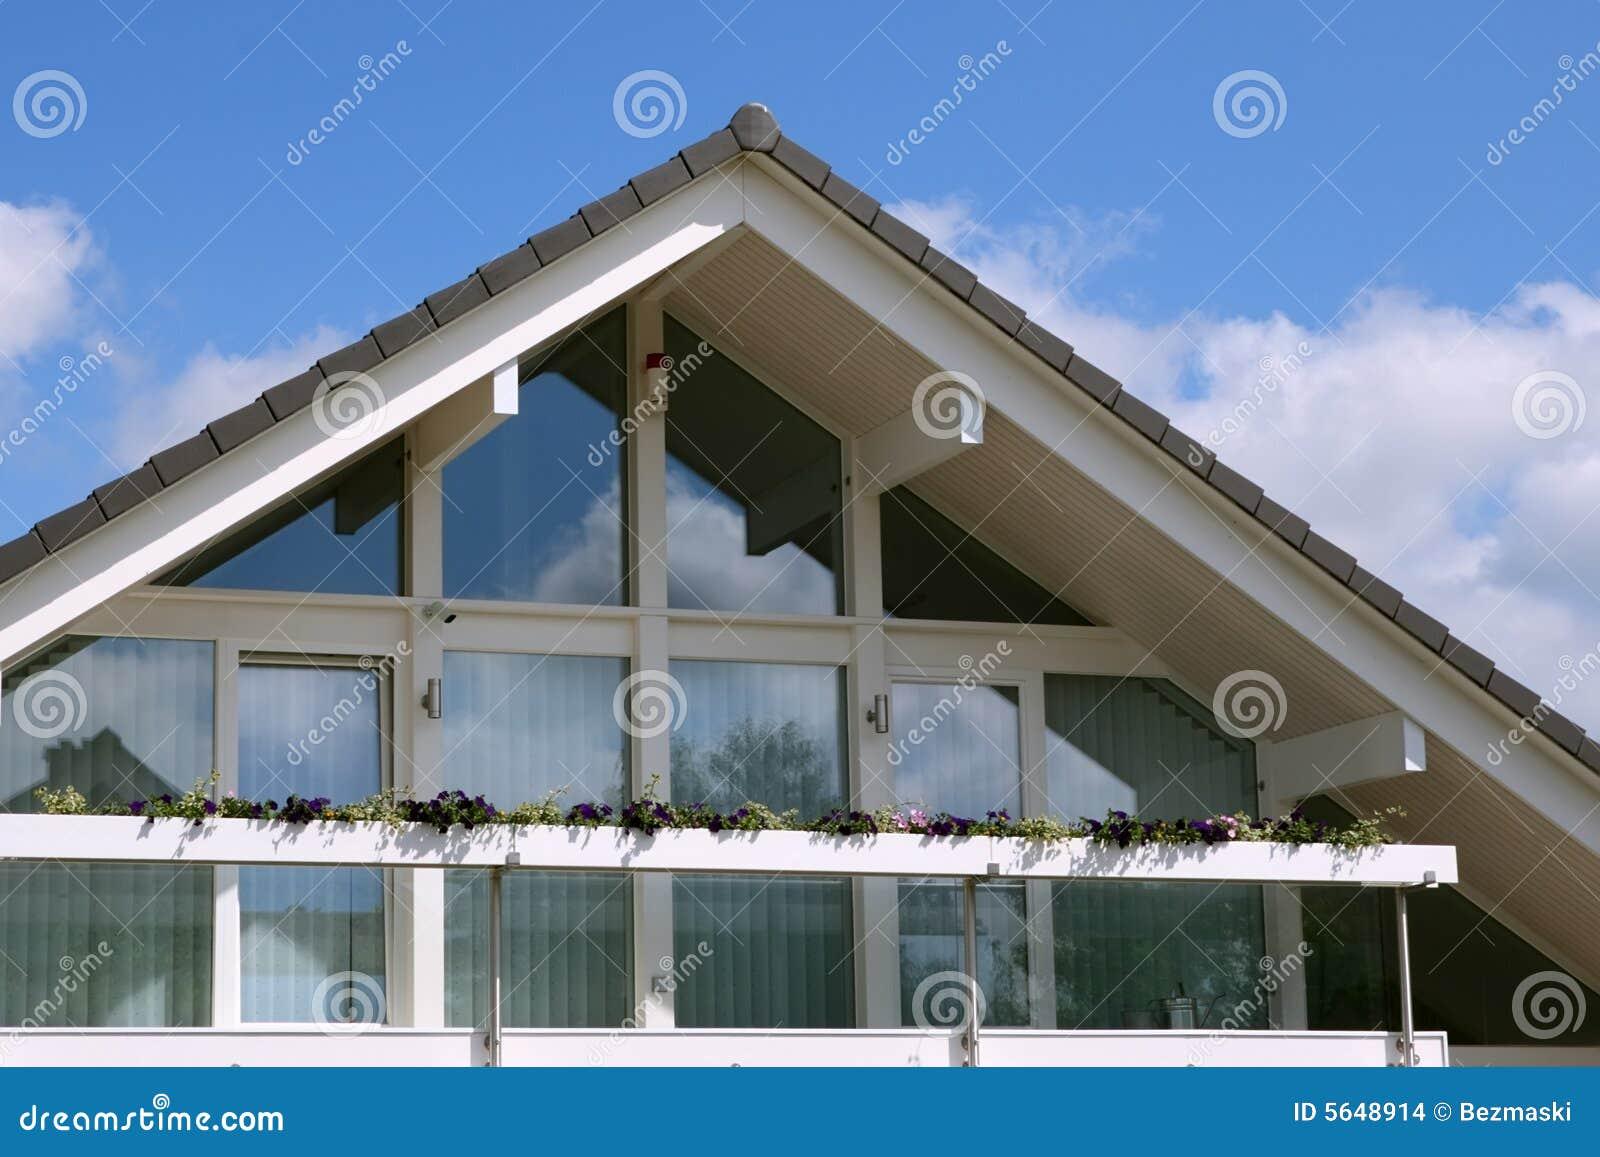 Modern house with balcony blue sky stock photo image for Blue modern house